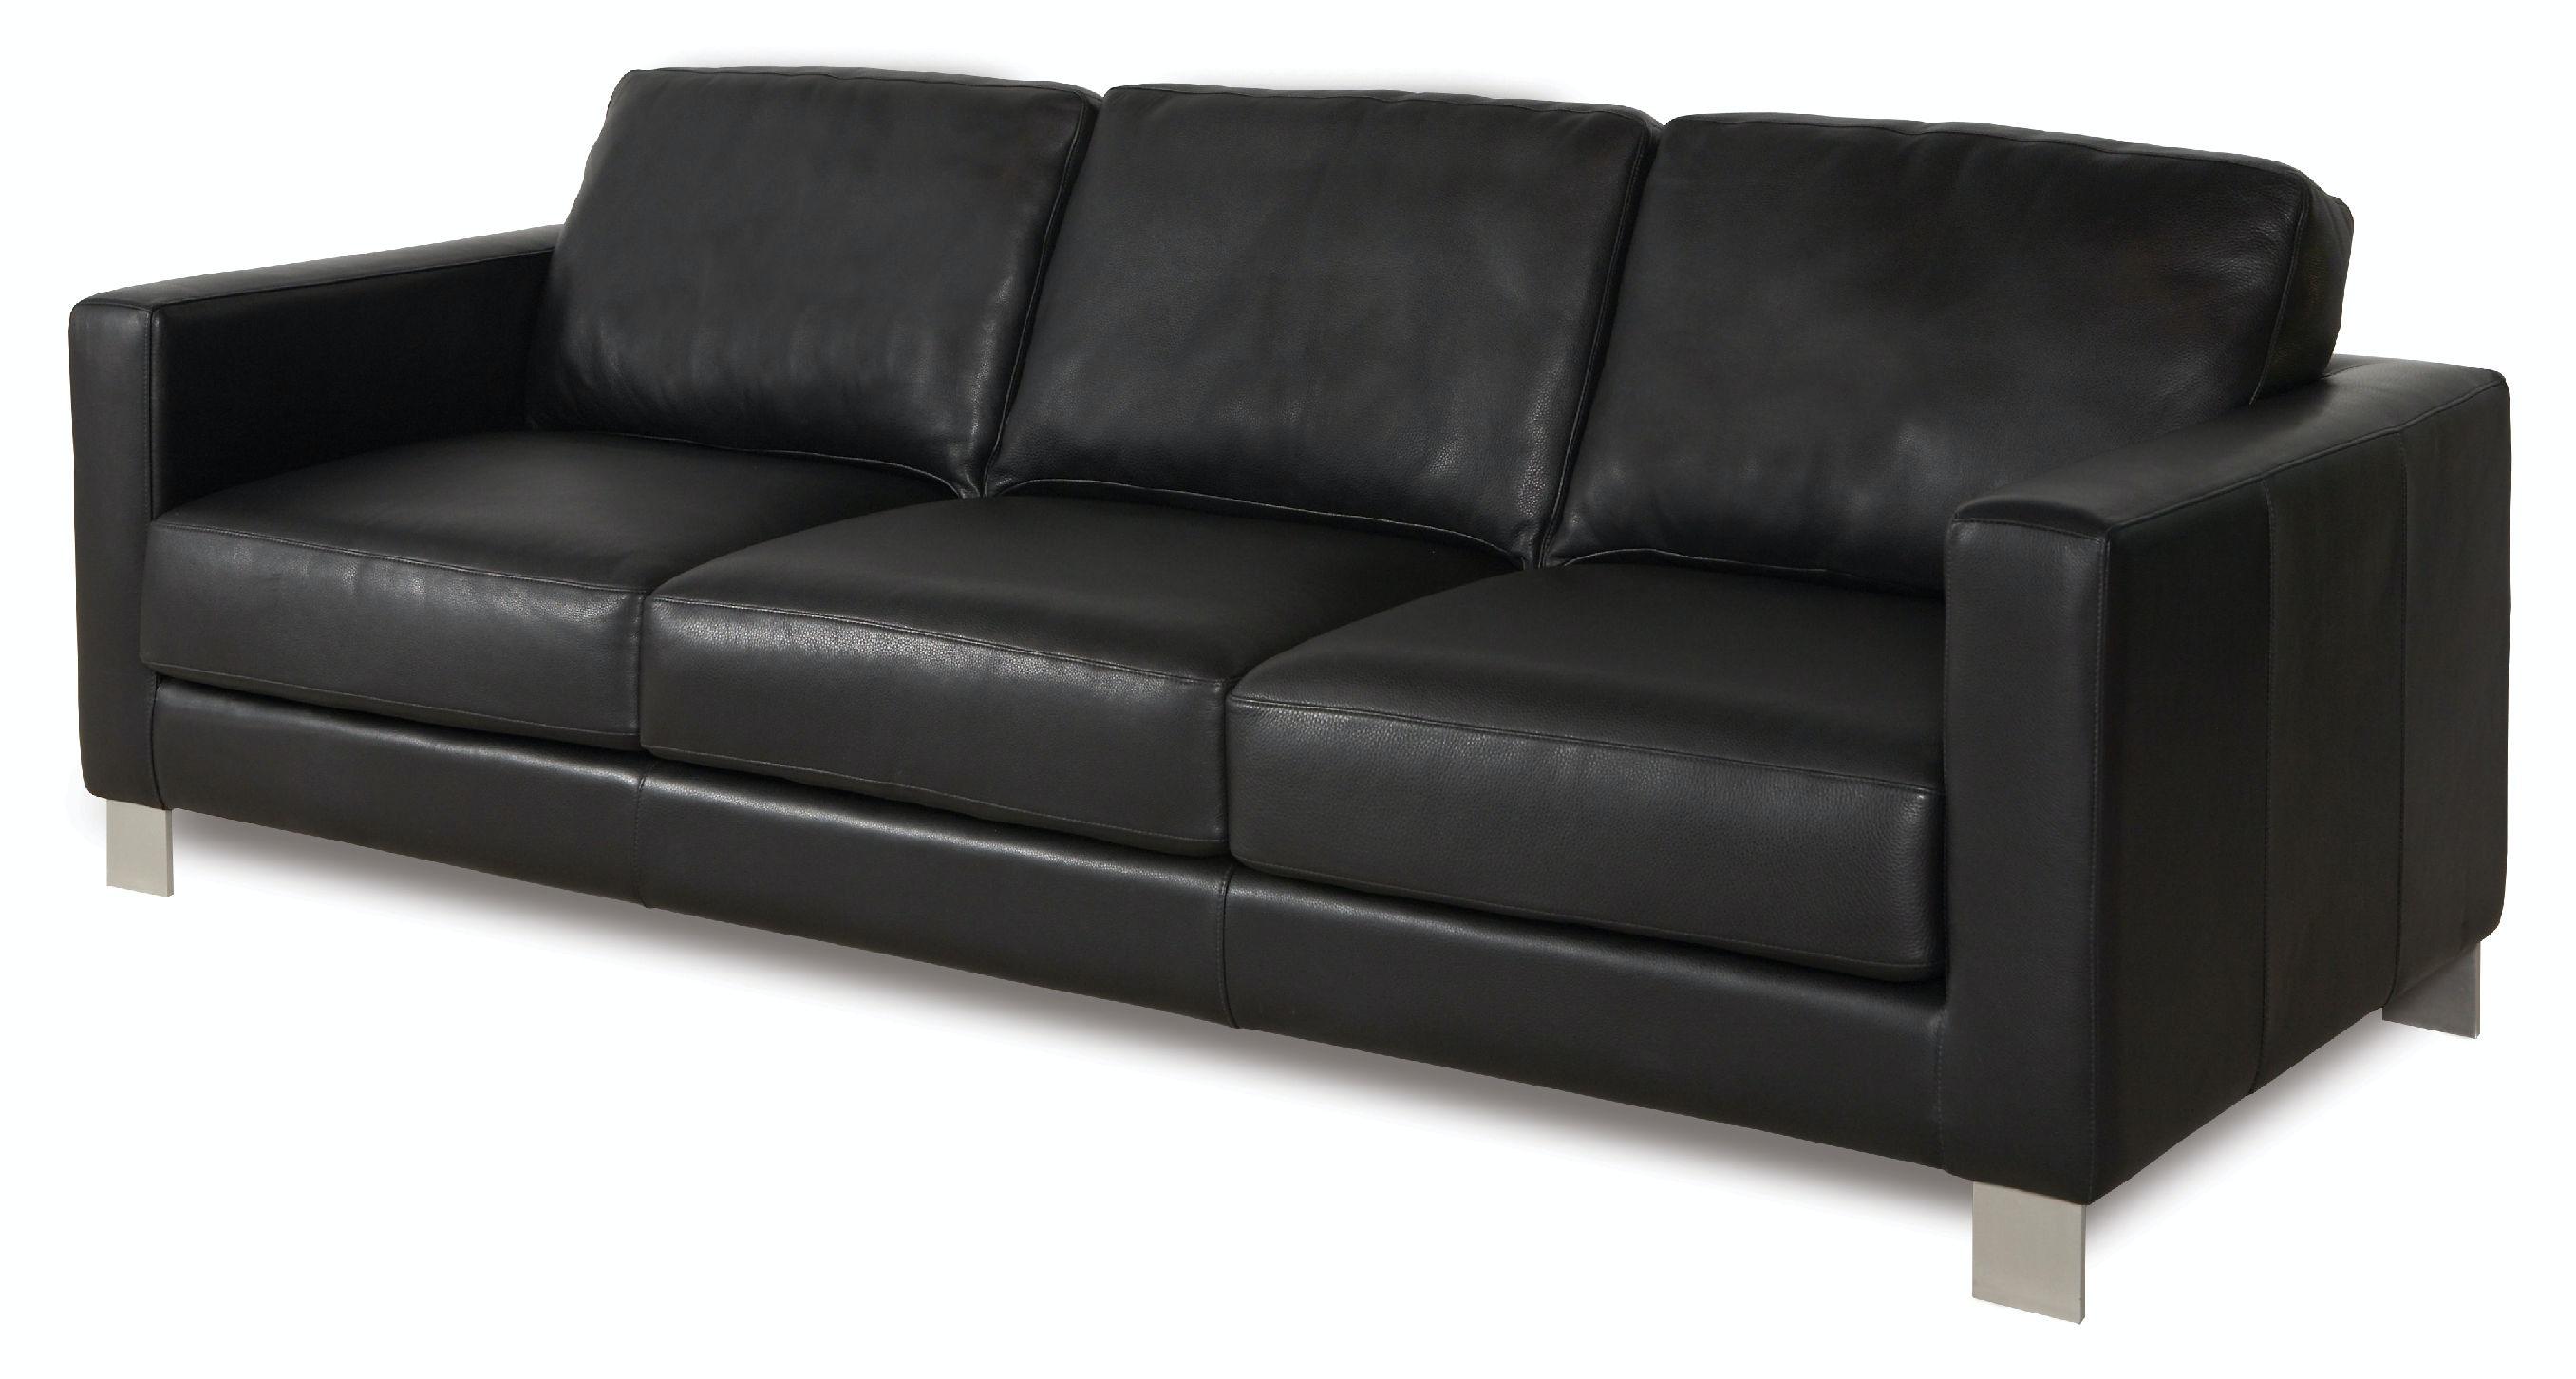 Superbe ALE SO3 ST. Three Cushion Sofa